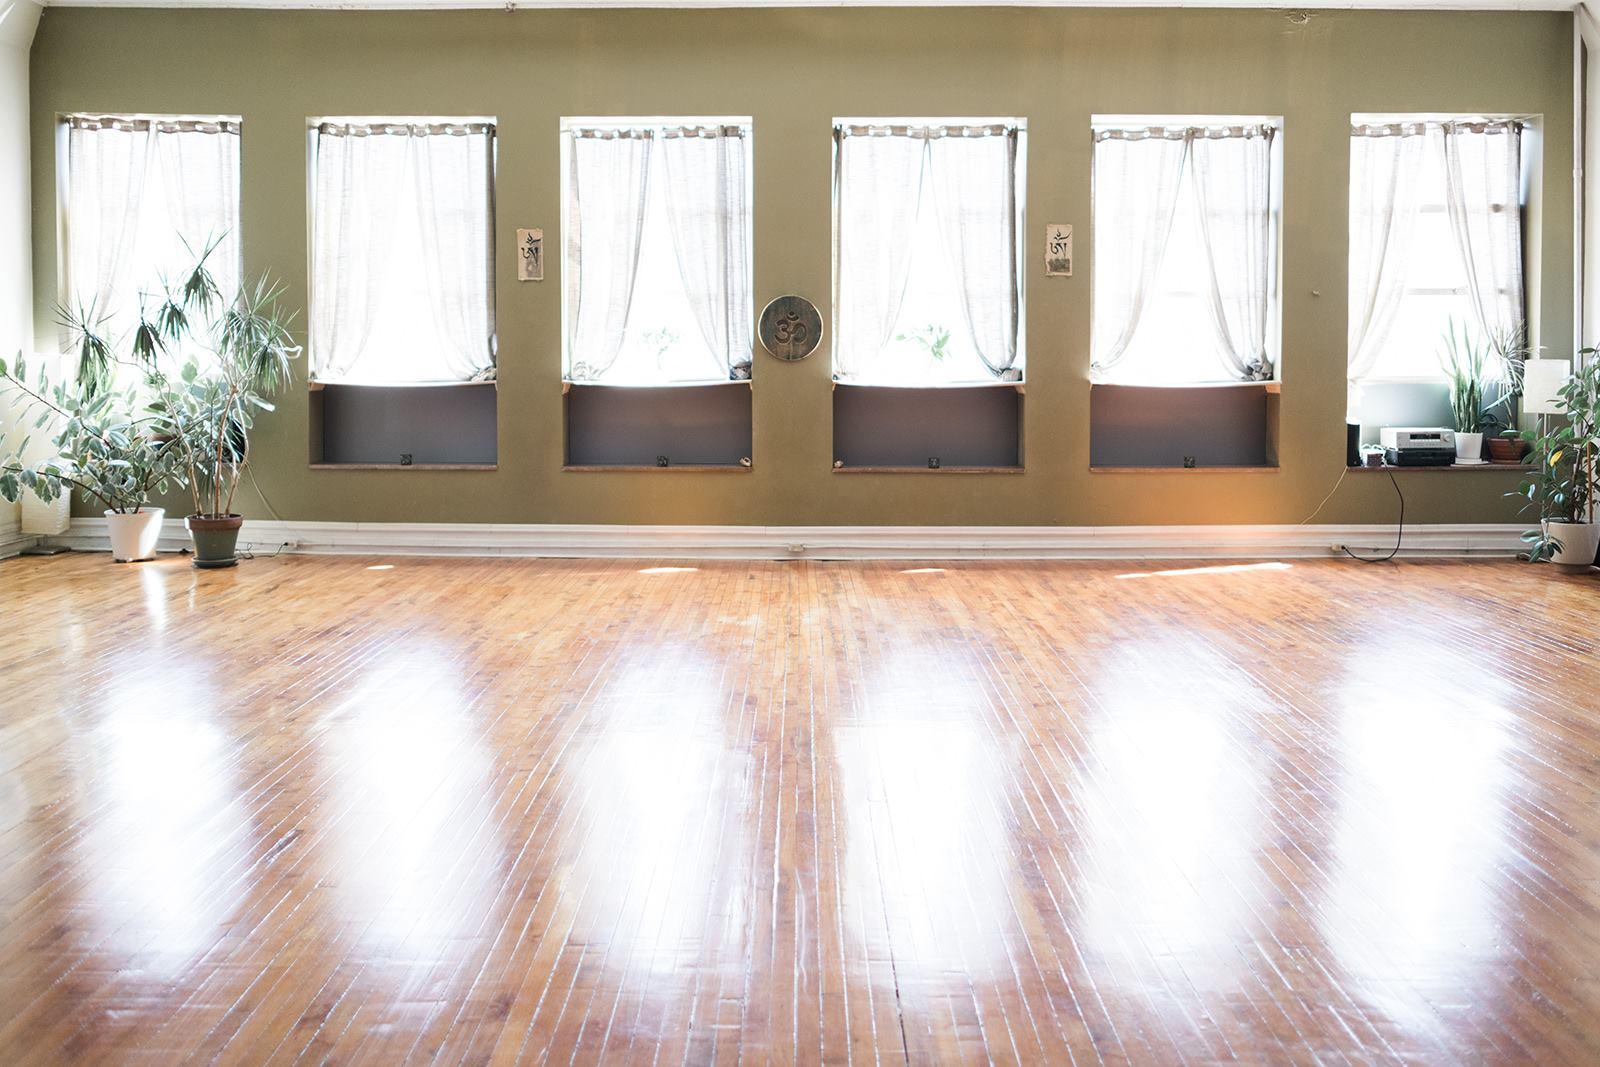 BYS yoga collective studio